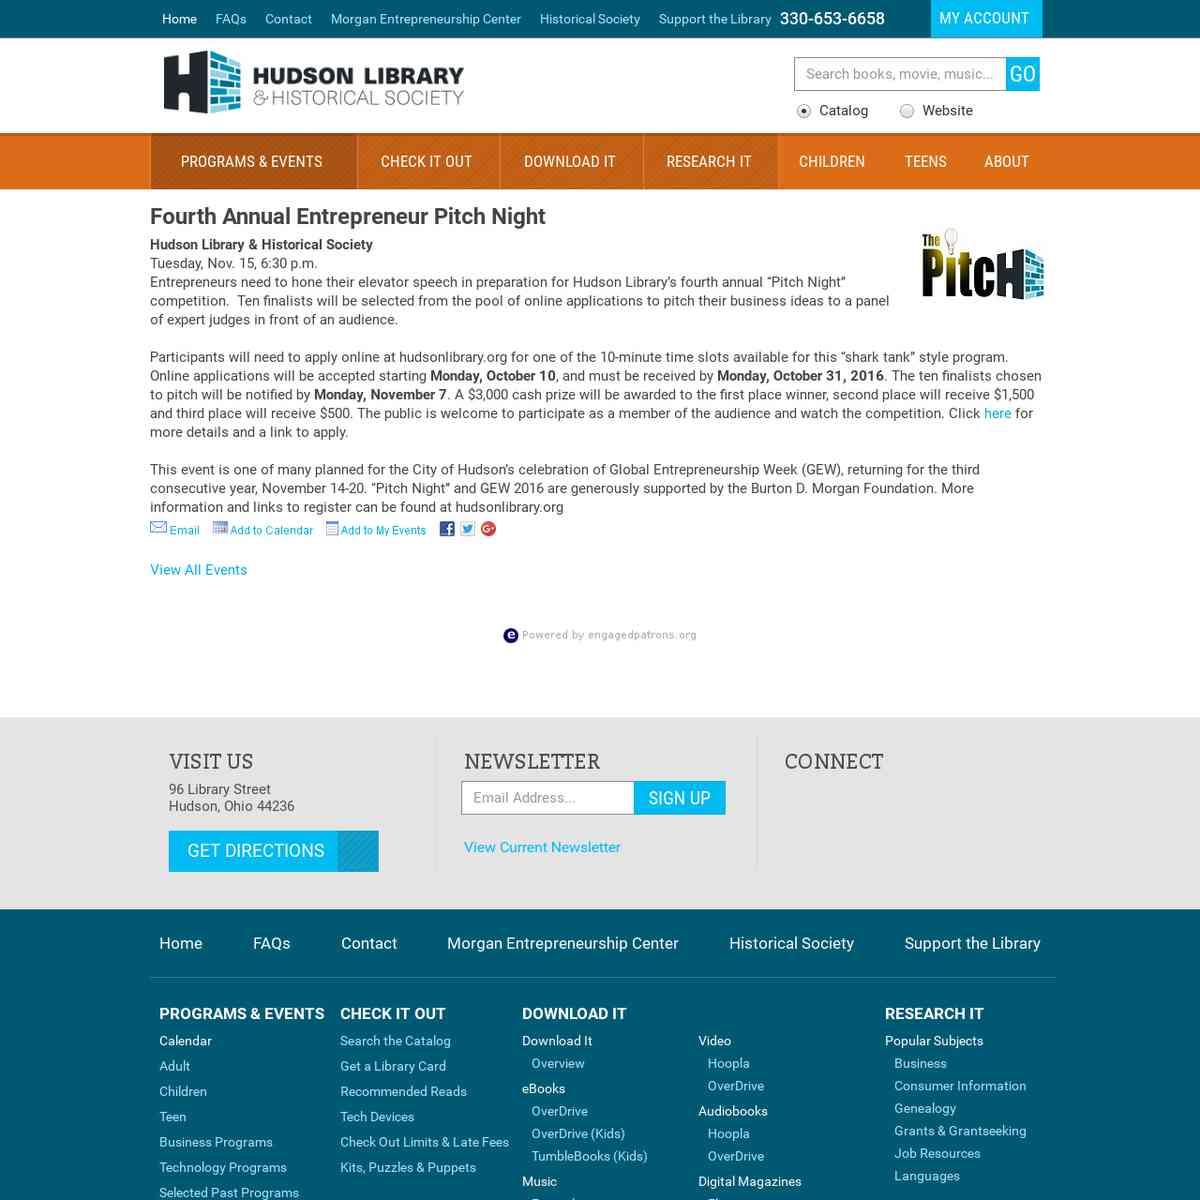 Hudson Library – HUDSON LIBRARY & HISTORICAL SOCIETY